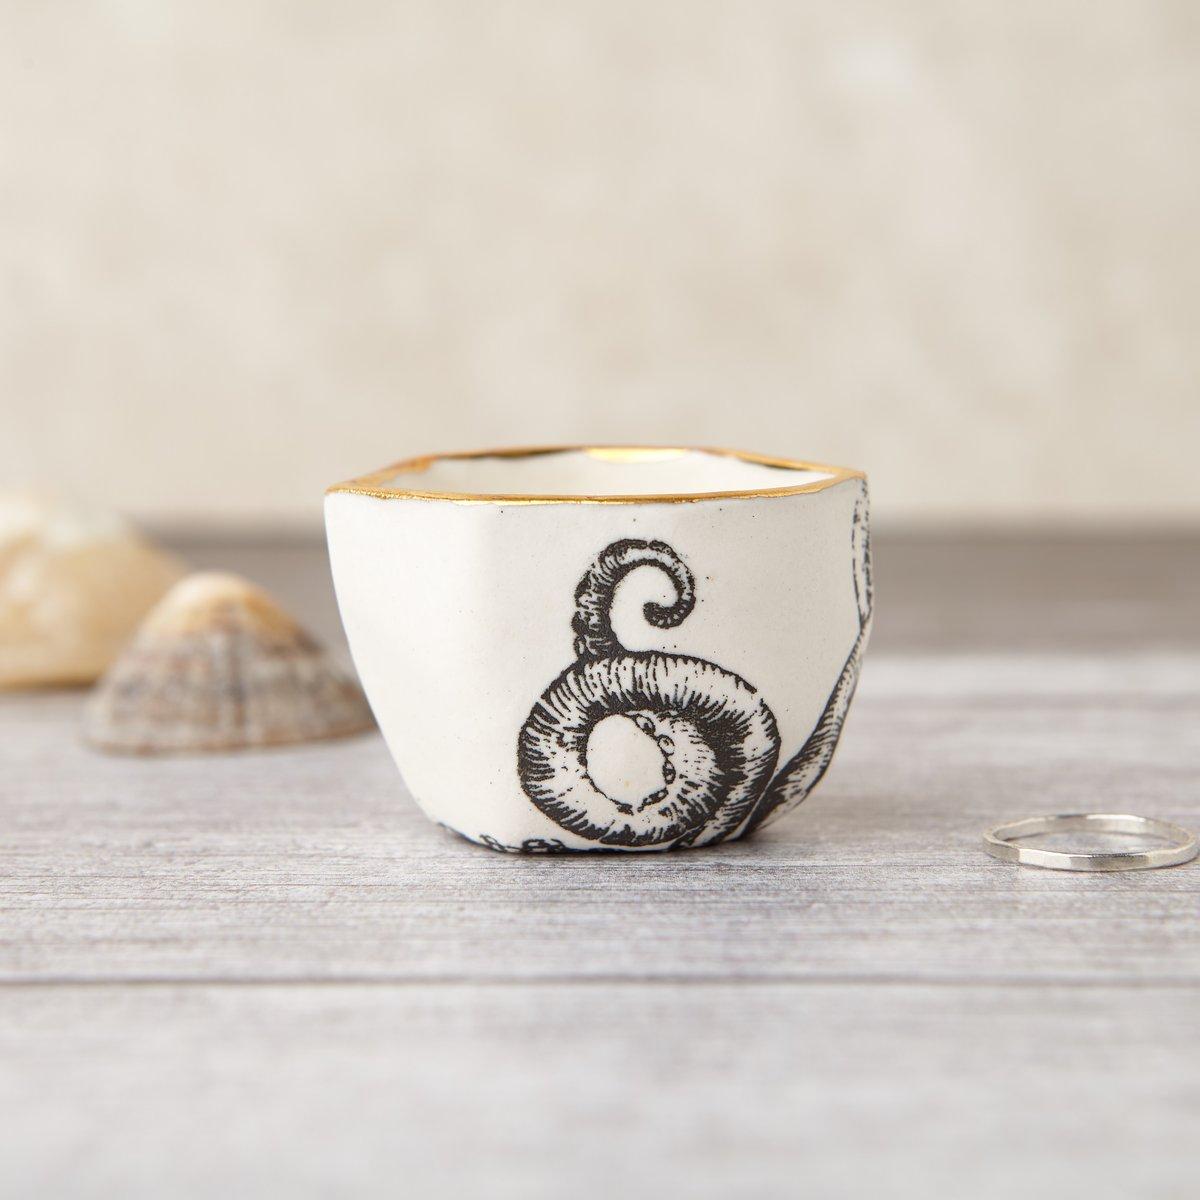 Porcelain Octopus Ring Pot